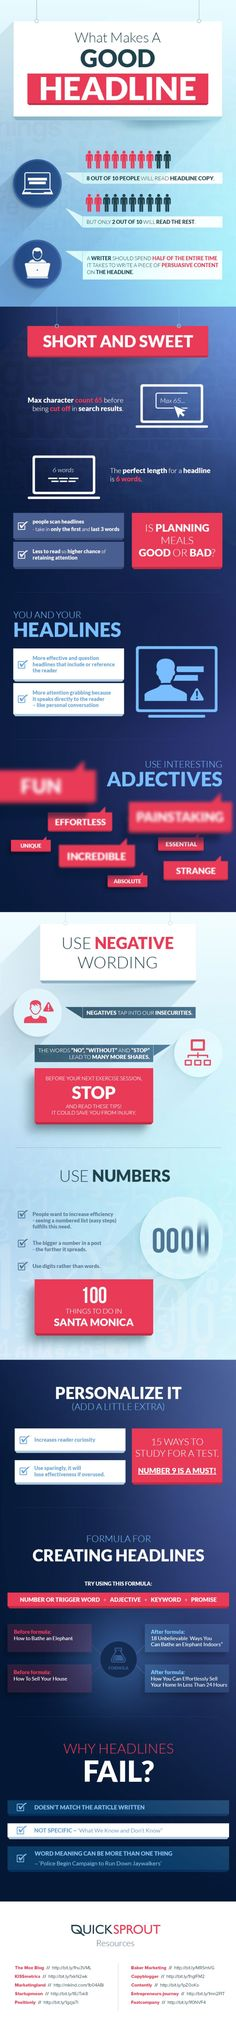 5 Sure Shot Ways to Write Catchy Headlines [Infographic] image whatmakesagoodheadline